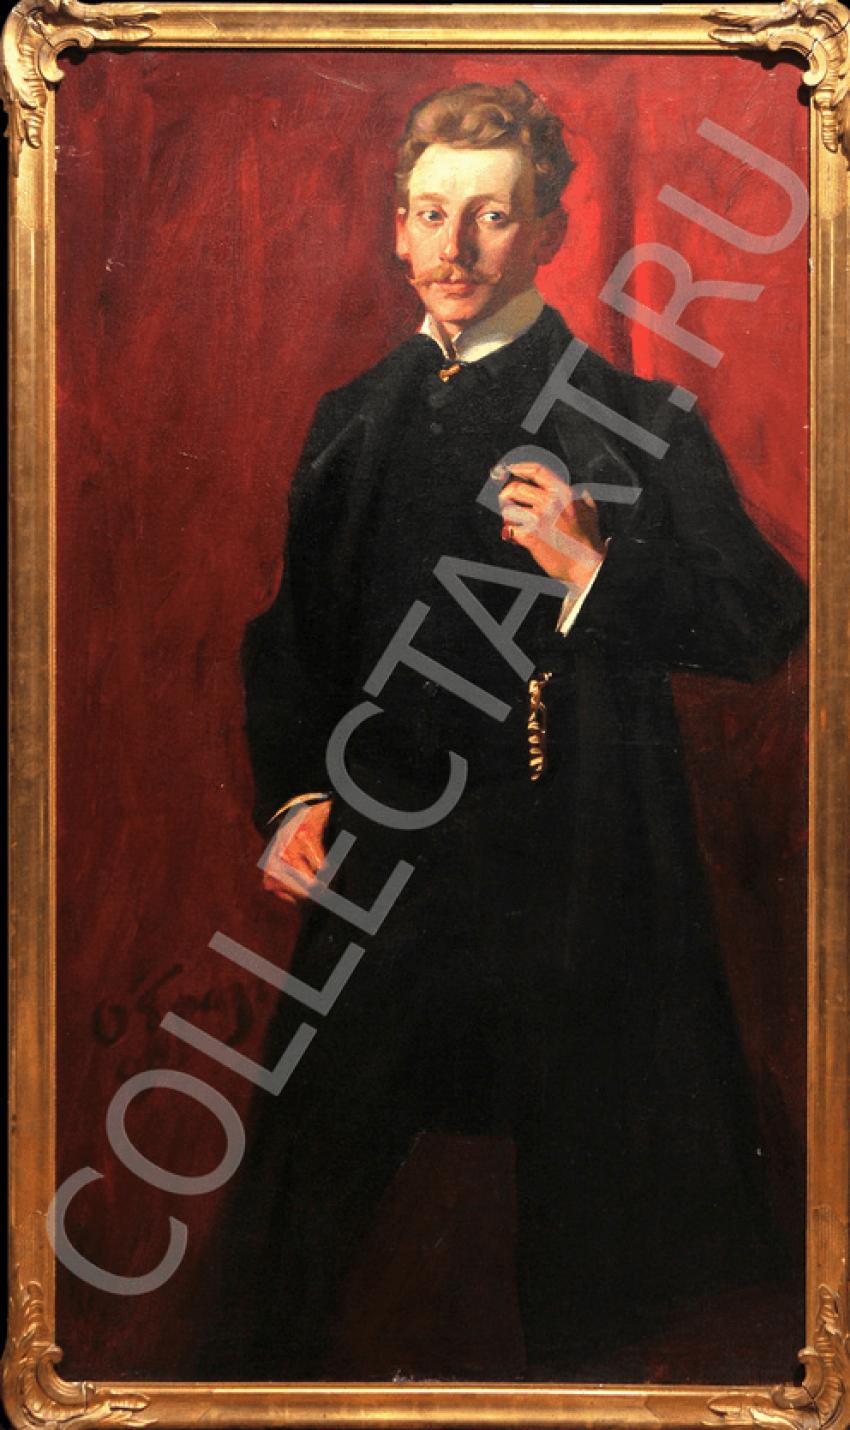 BRAZ OSIP EMMANUILOVICH (1873 – 1936) - photo 1